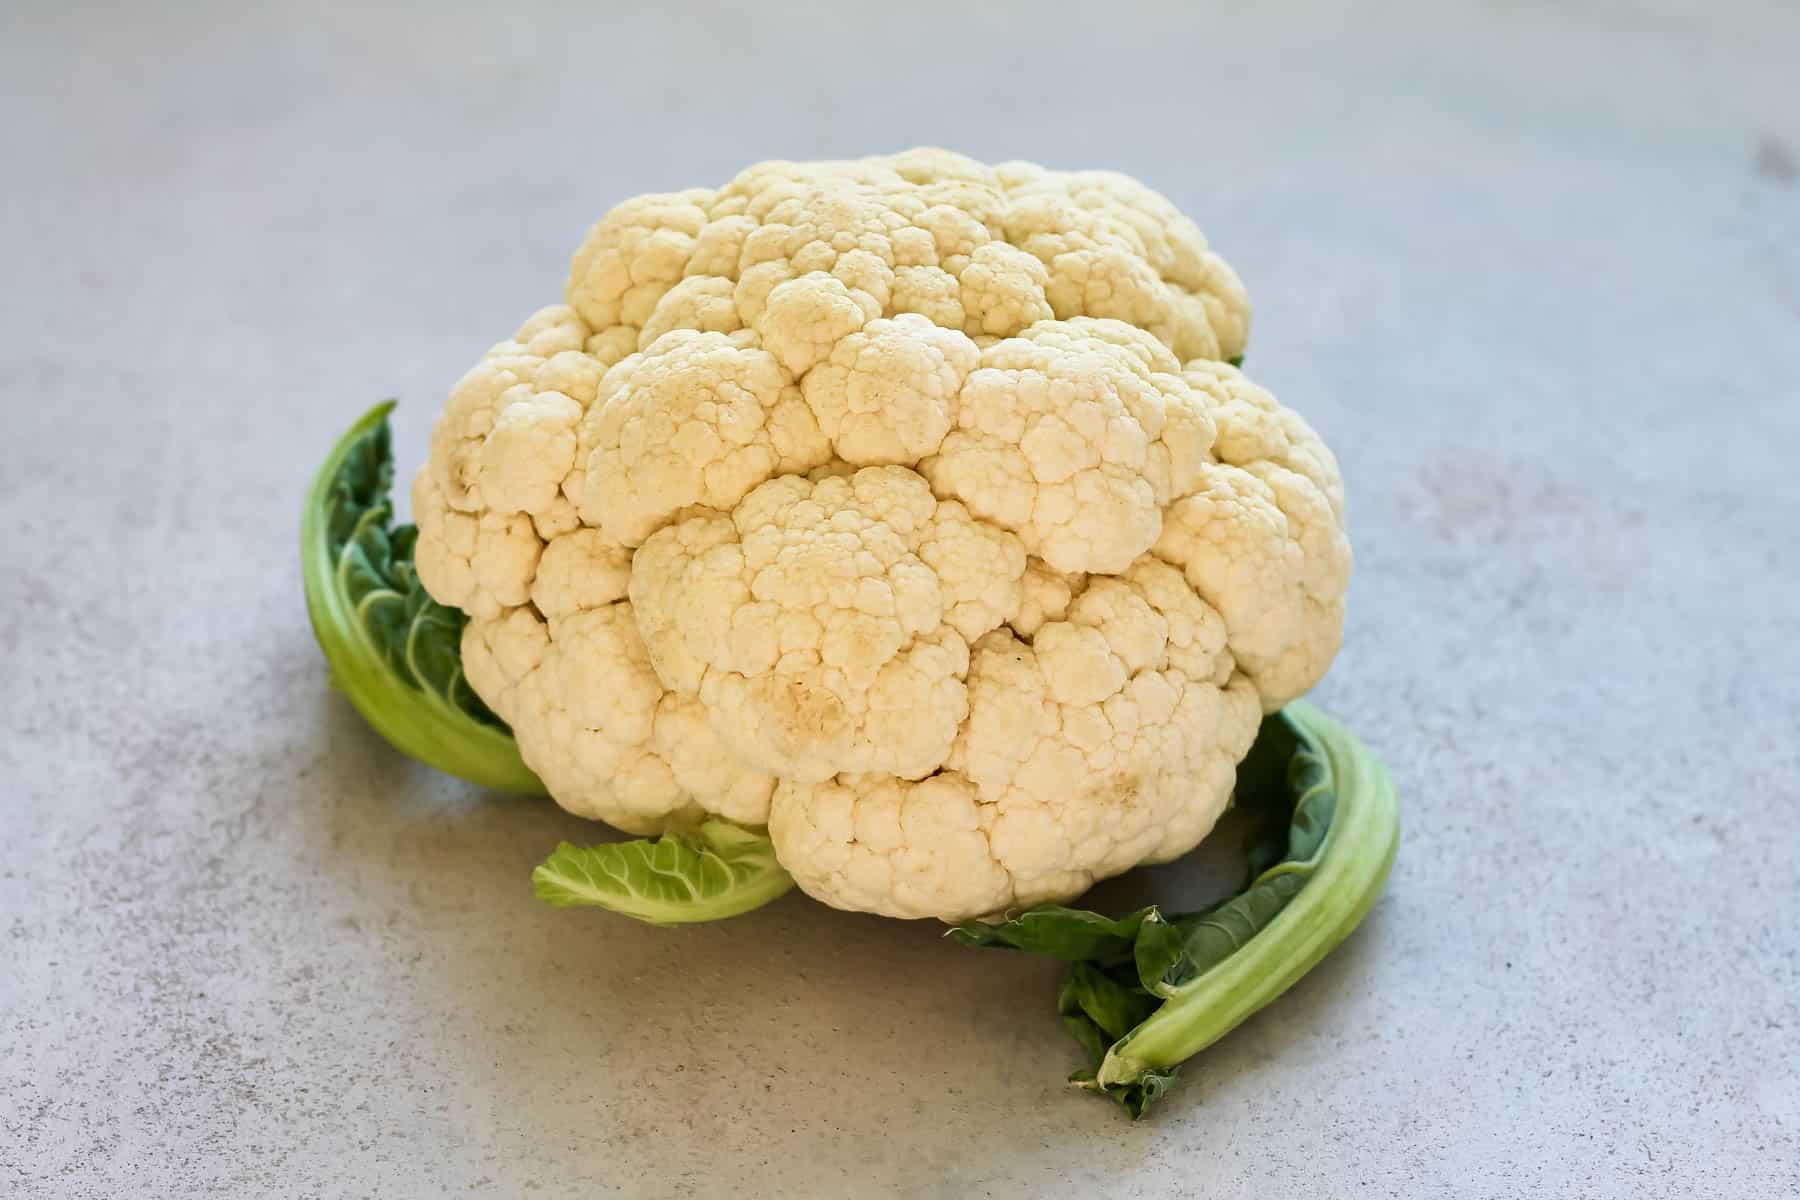 cauliflower on a grey background